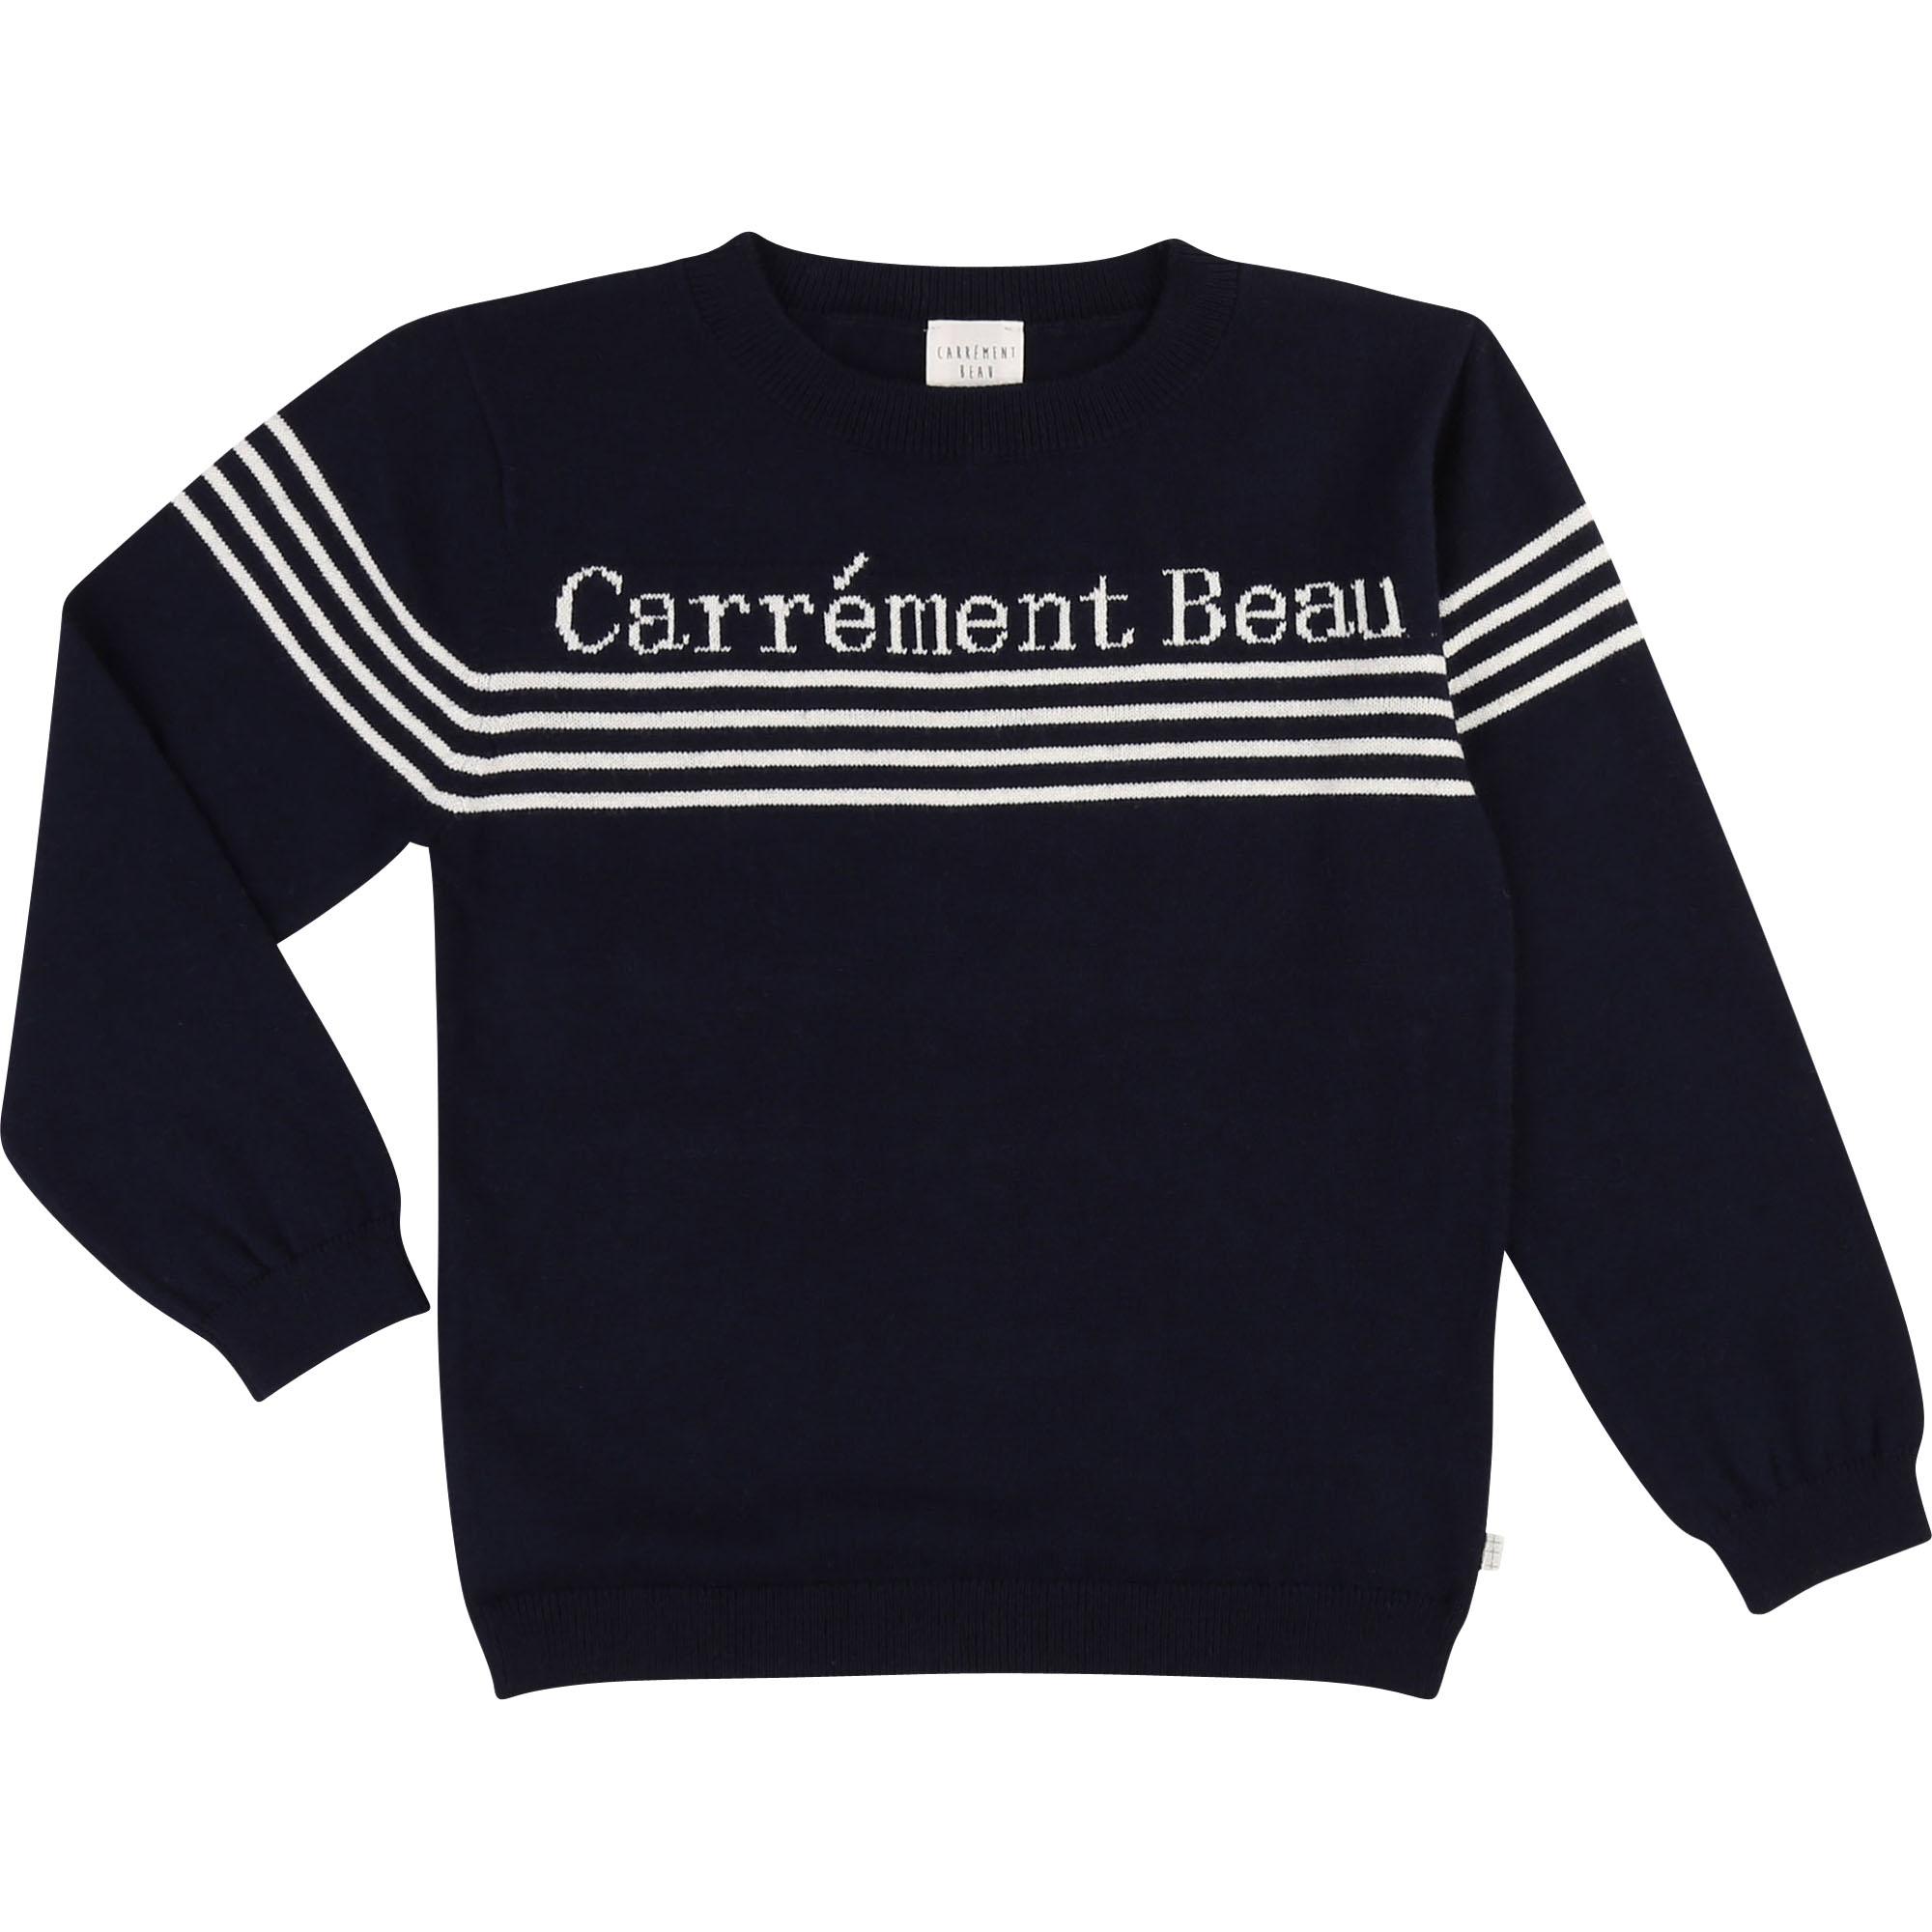 Carrement Beau Neulepusero koko 126 cm ja 138 cm ALE -50% (OVH 49,00€)